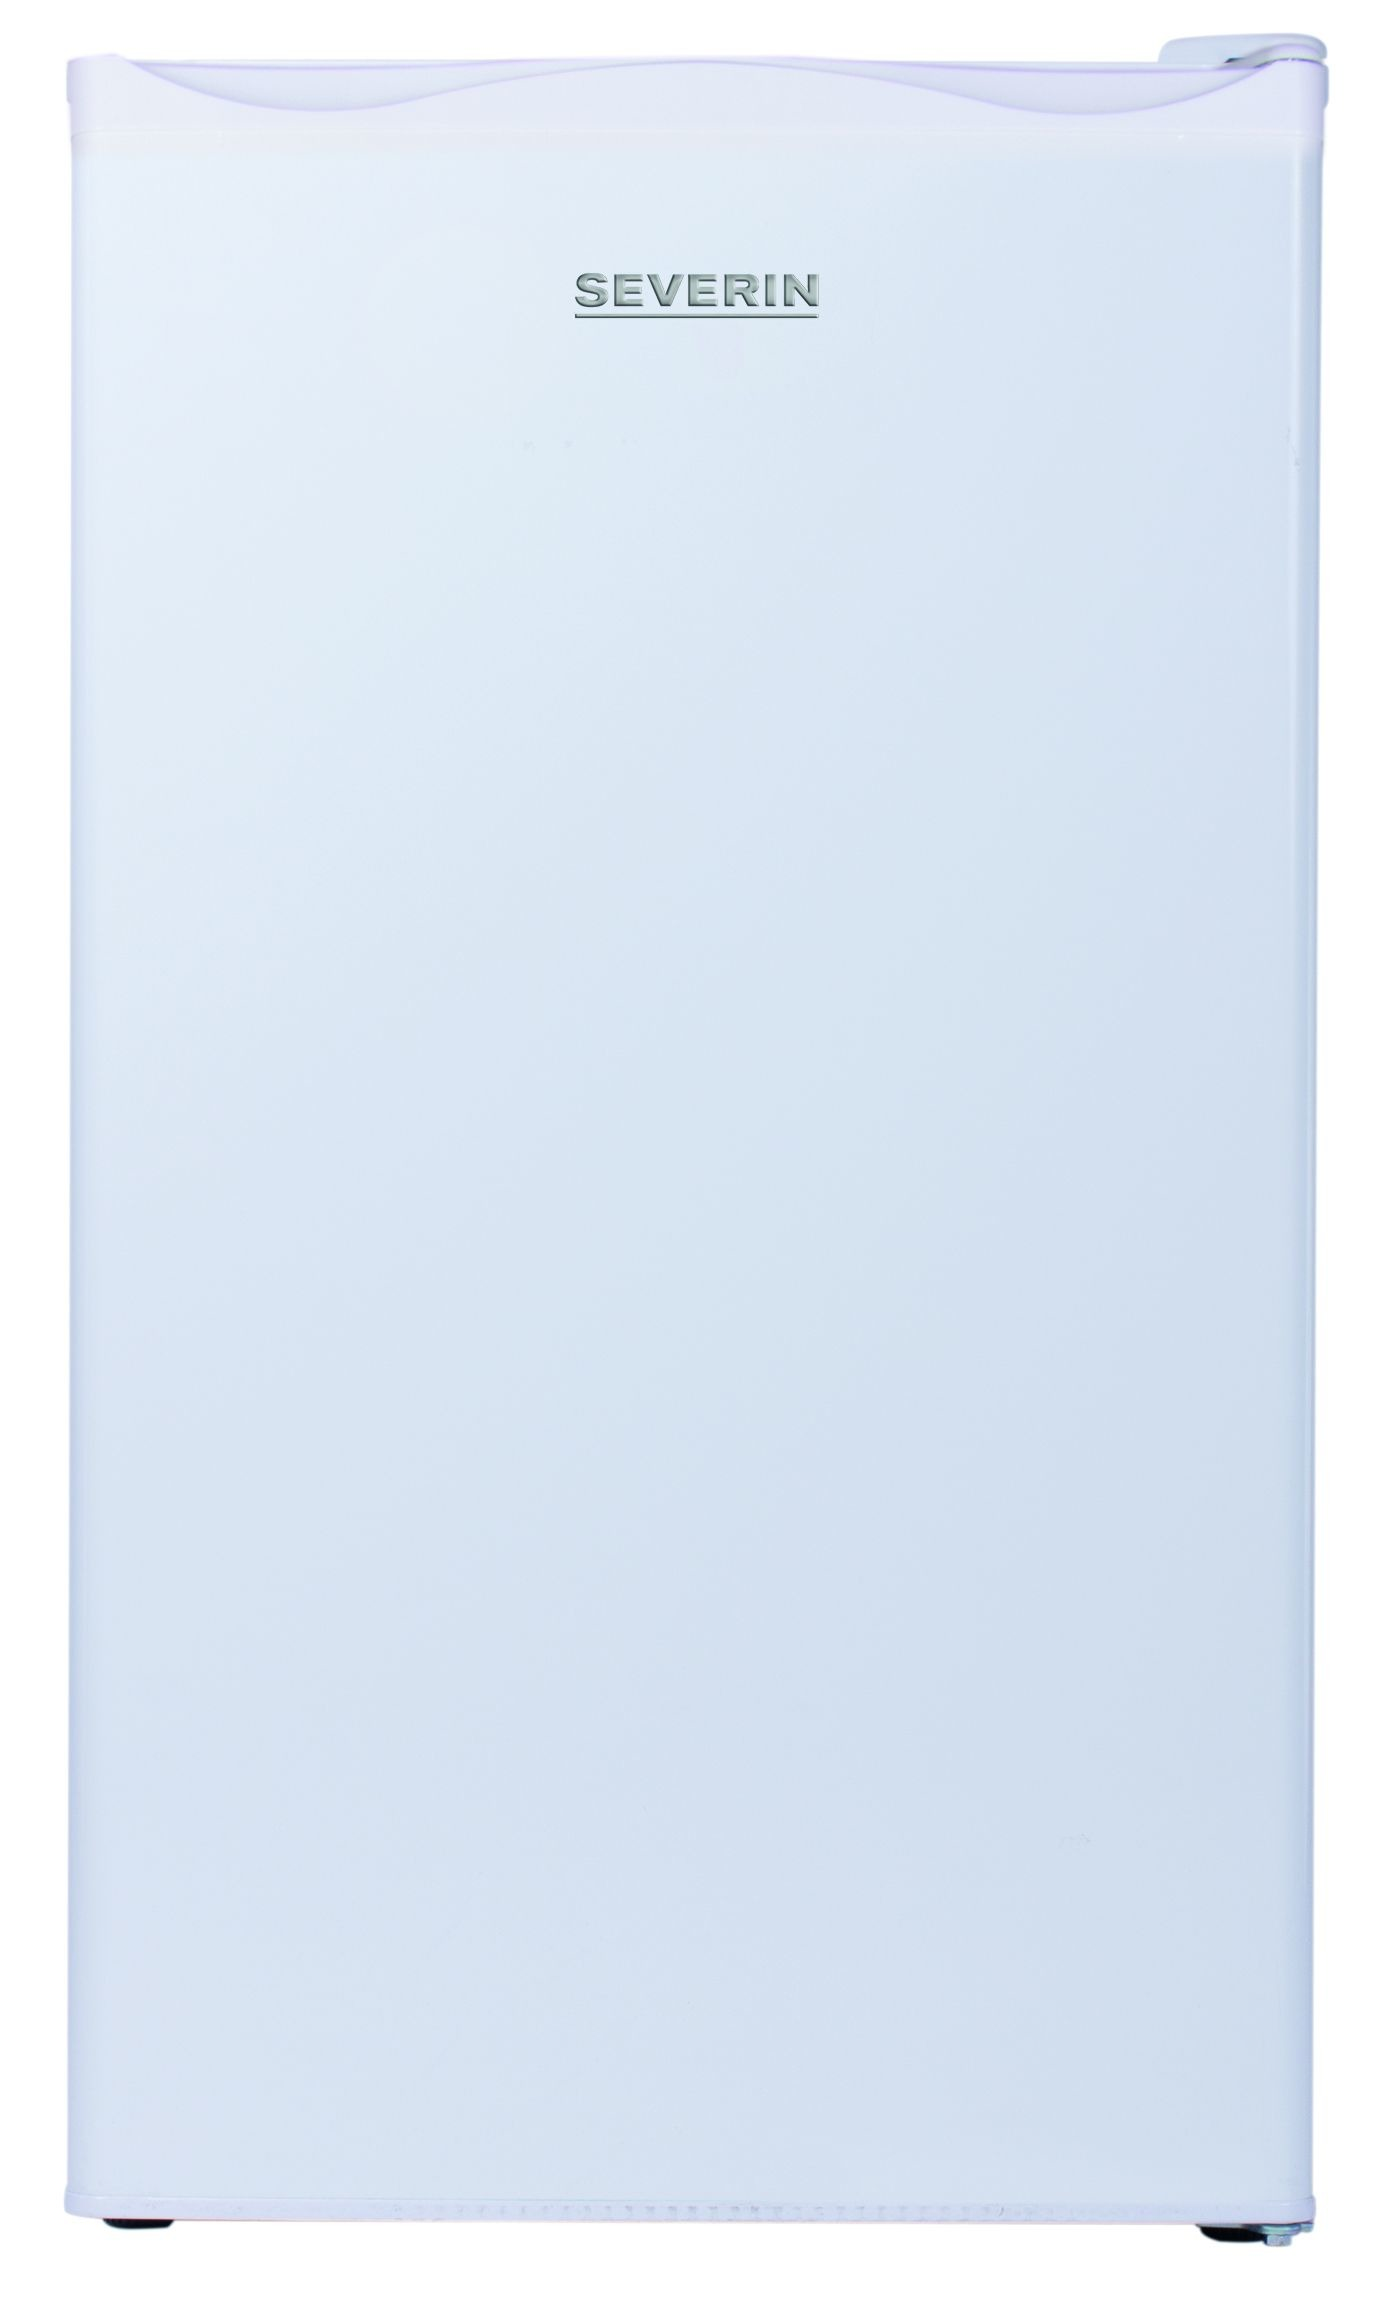 Severin VKS8805 minikoelkast